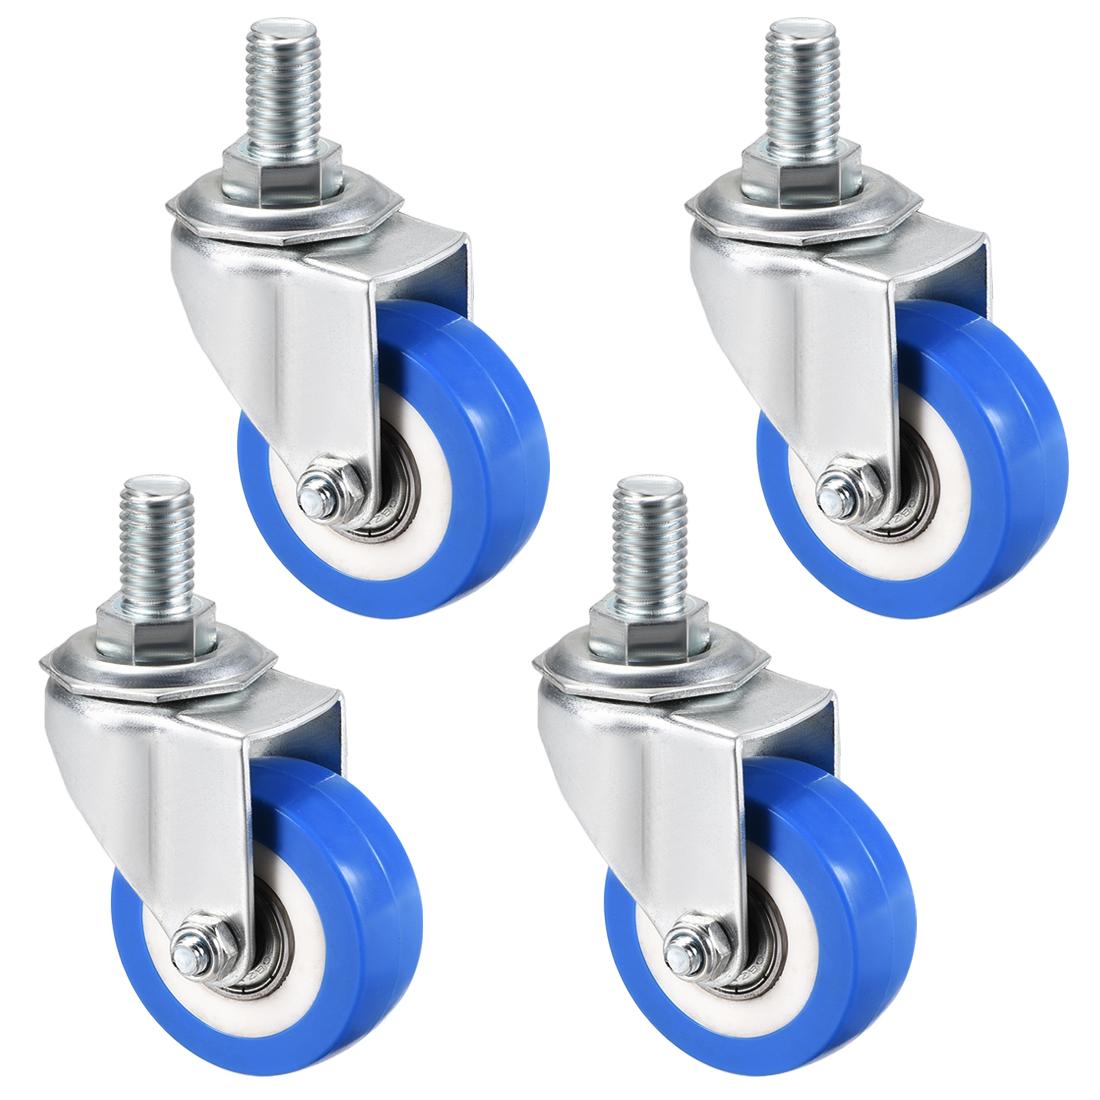 Swivel Caster Wheels PU Caster 2 Inch M12 x 20mm Thread 132lb Capacity , 4pcs